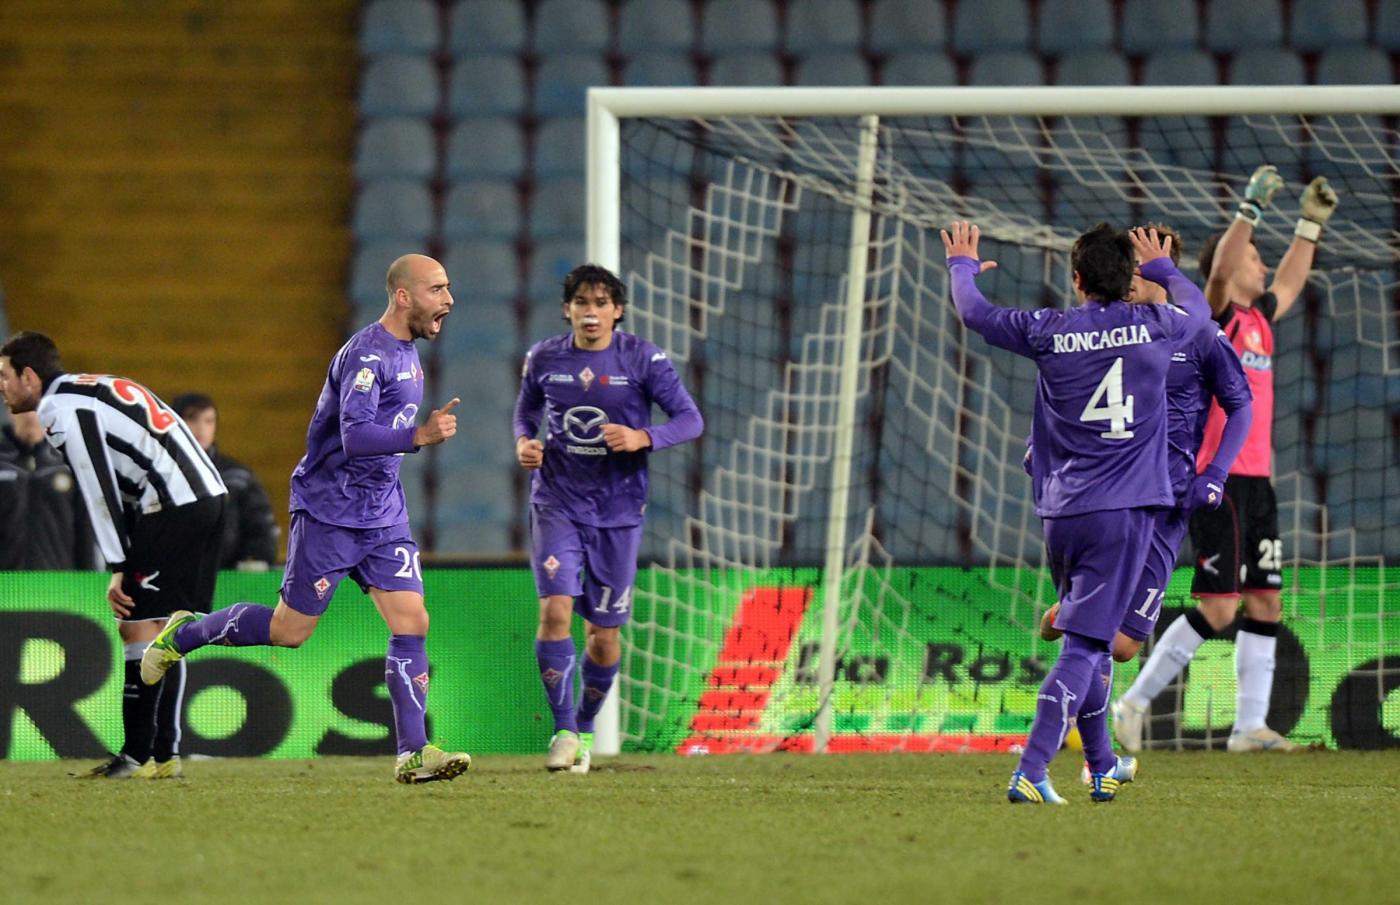 Ottavi Tim Cup: Udinese-Fiorentina 0-1, Borja Valero manda avanti i viola.